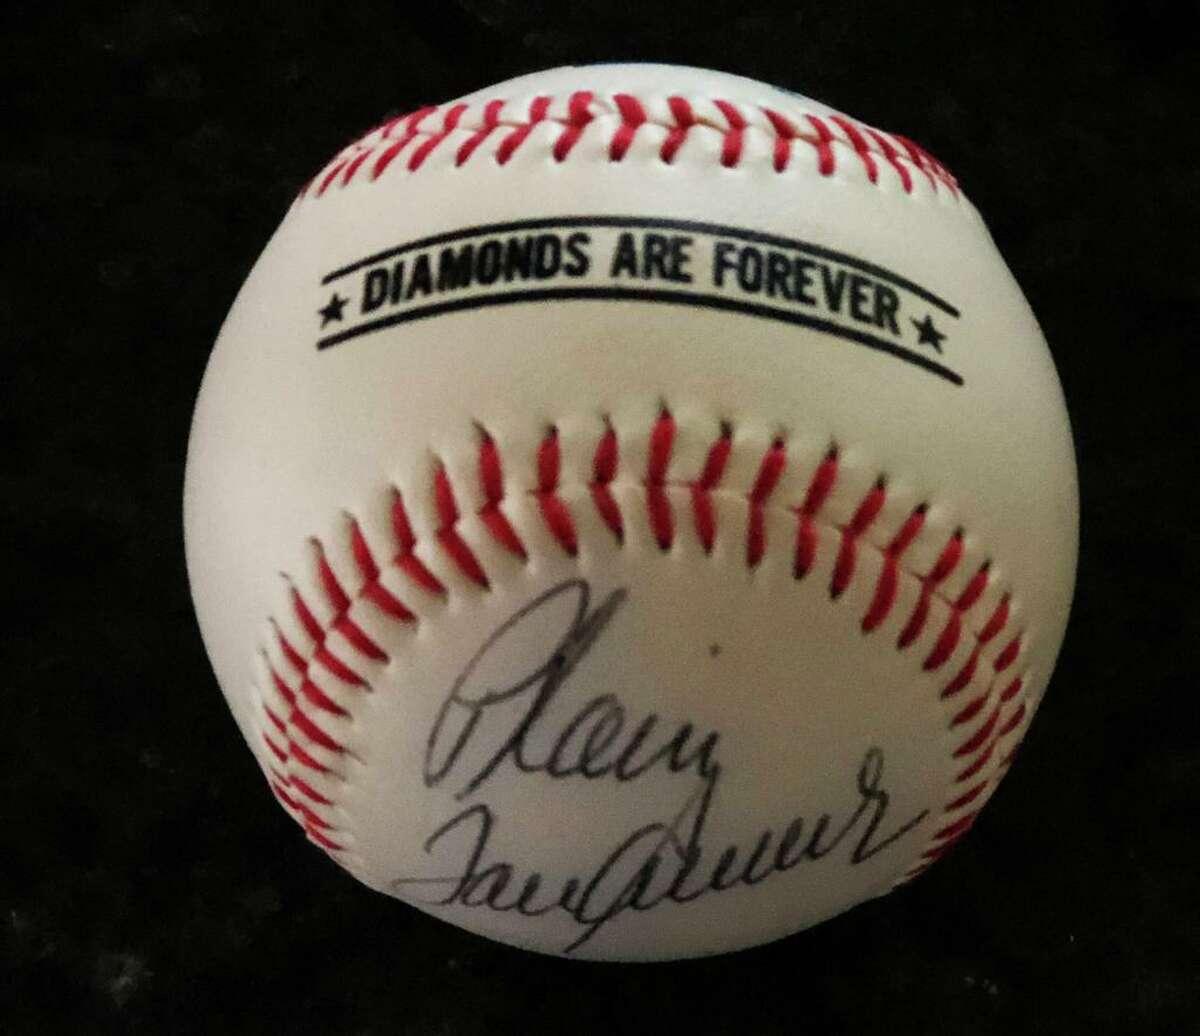 When Michael Lang asked baseball legend Tom Seaver to sign a baseball